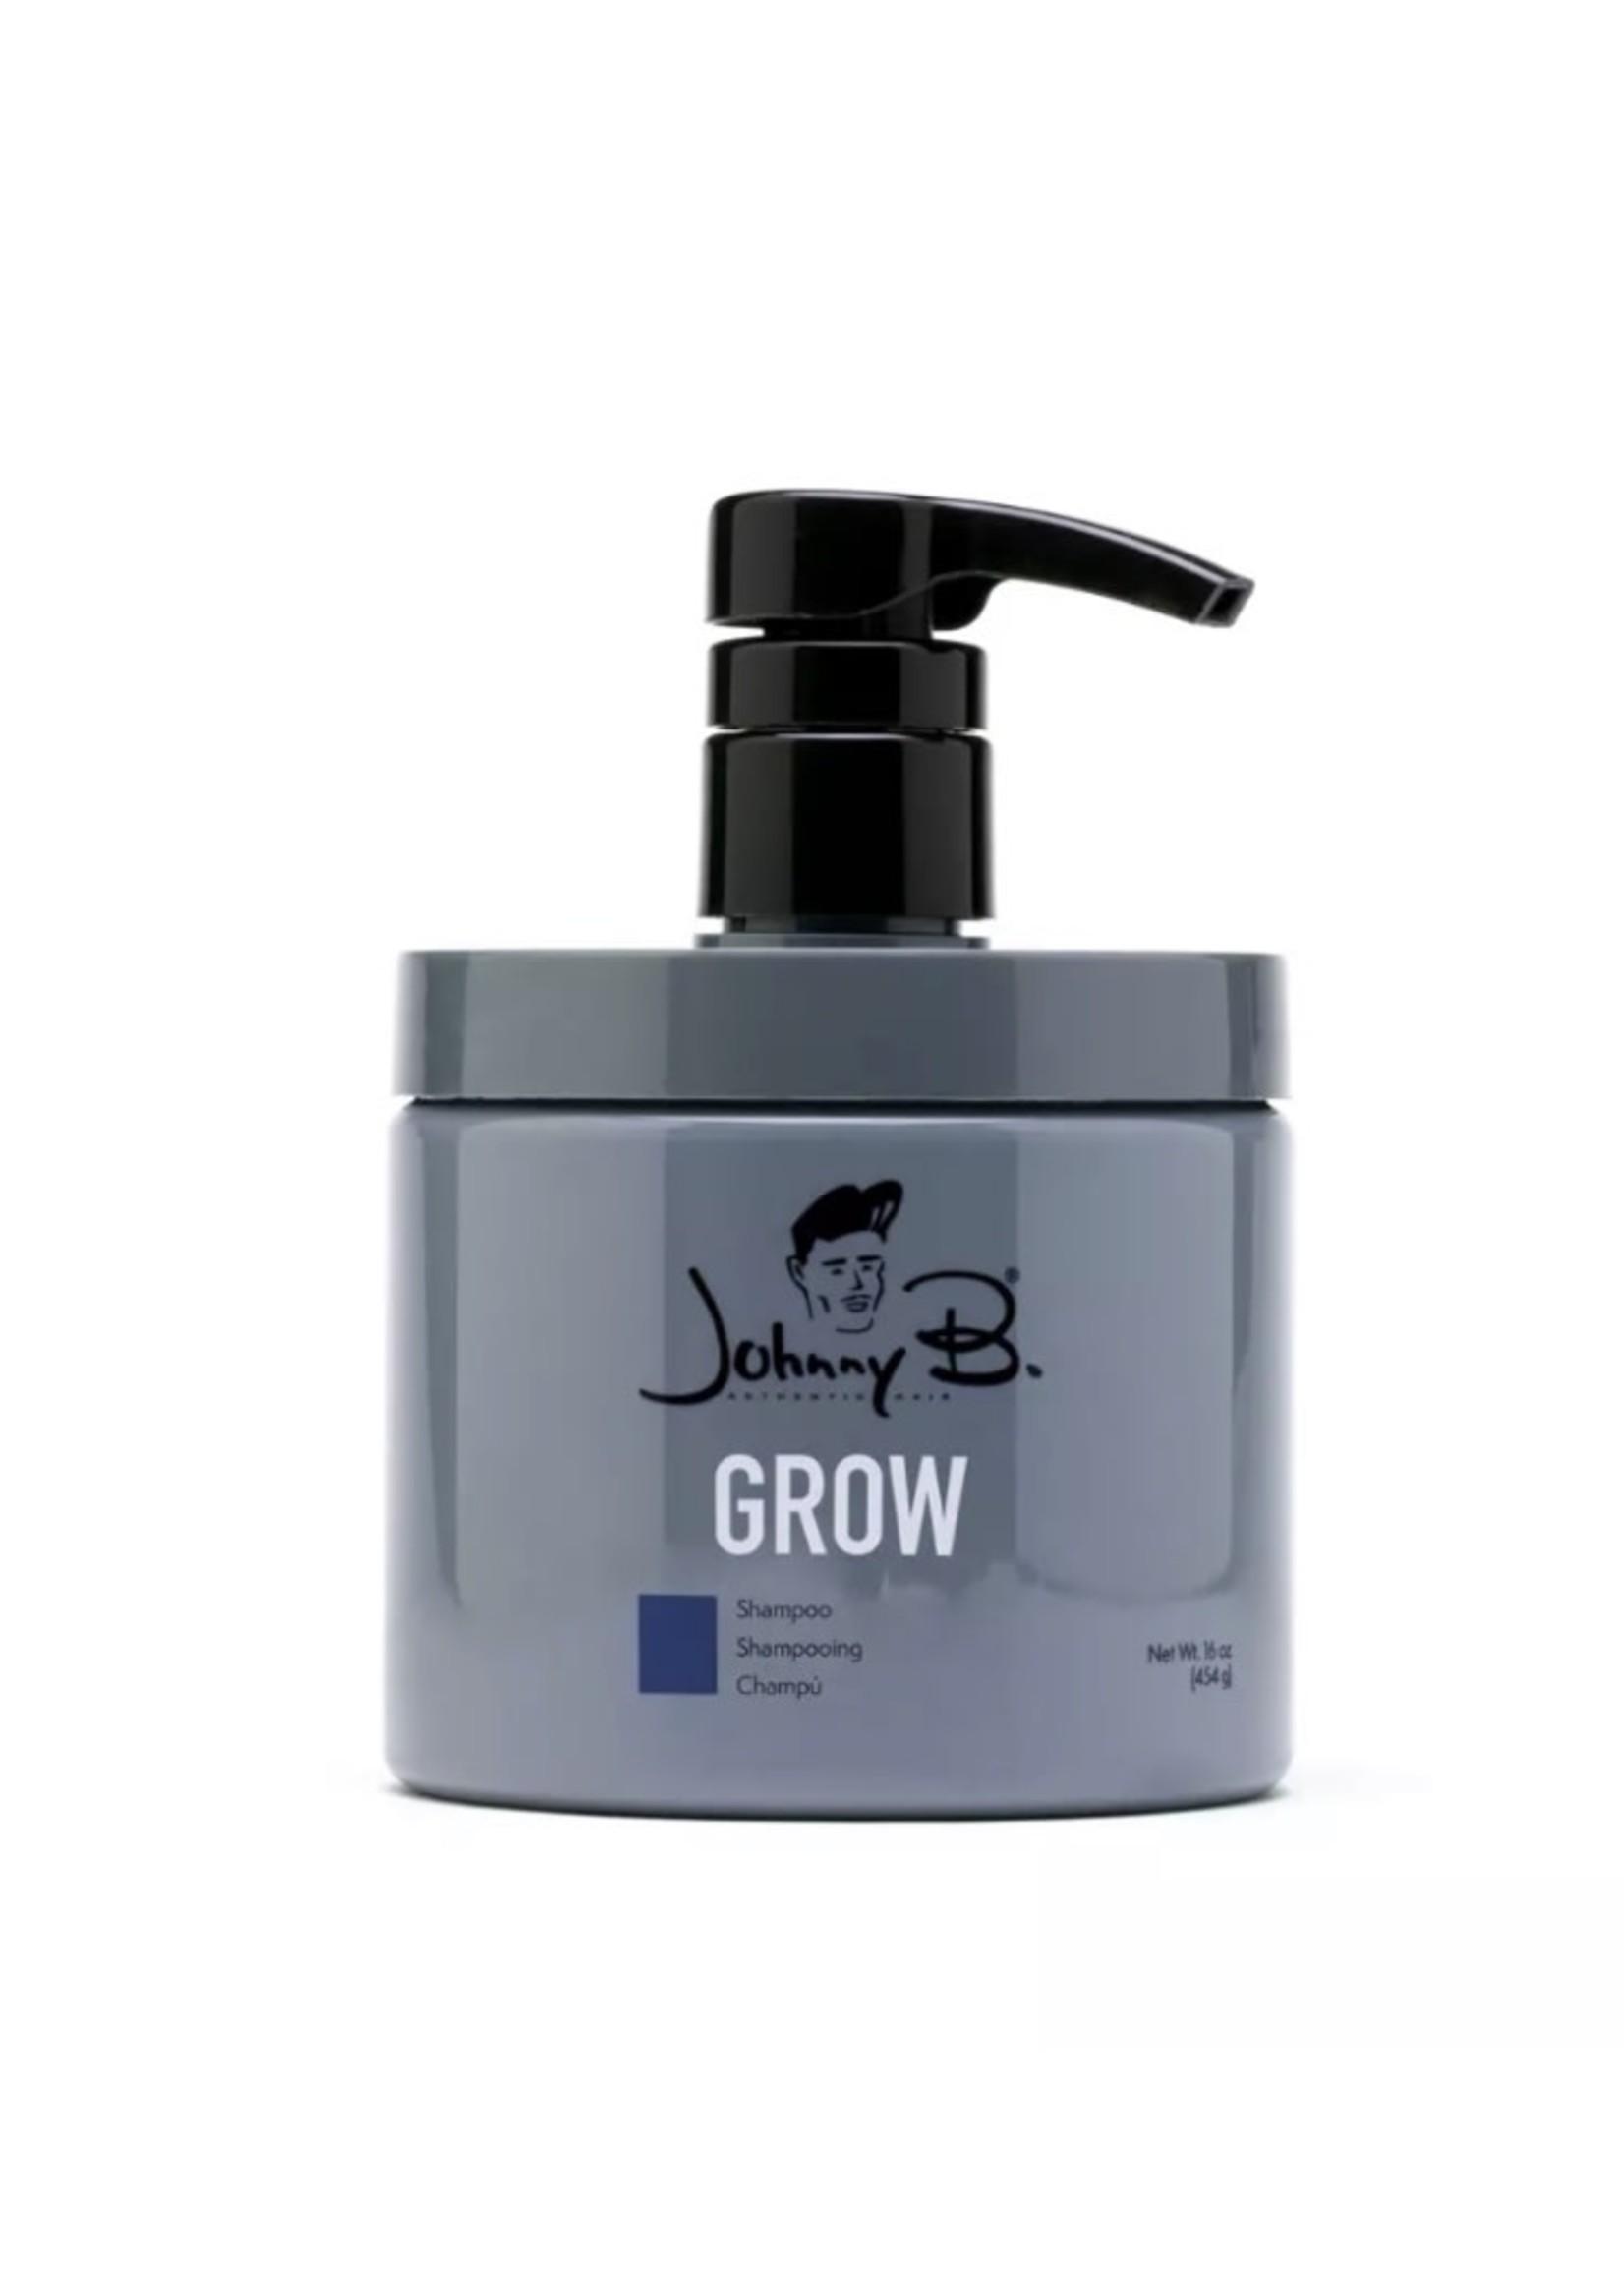 Johnny B Johnny B Grow Shampoo